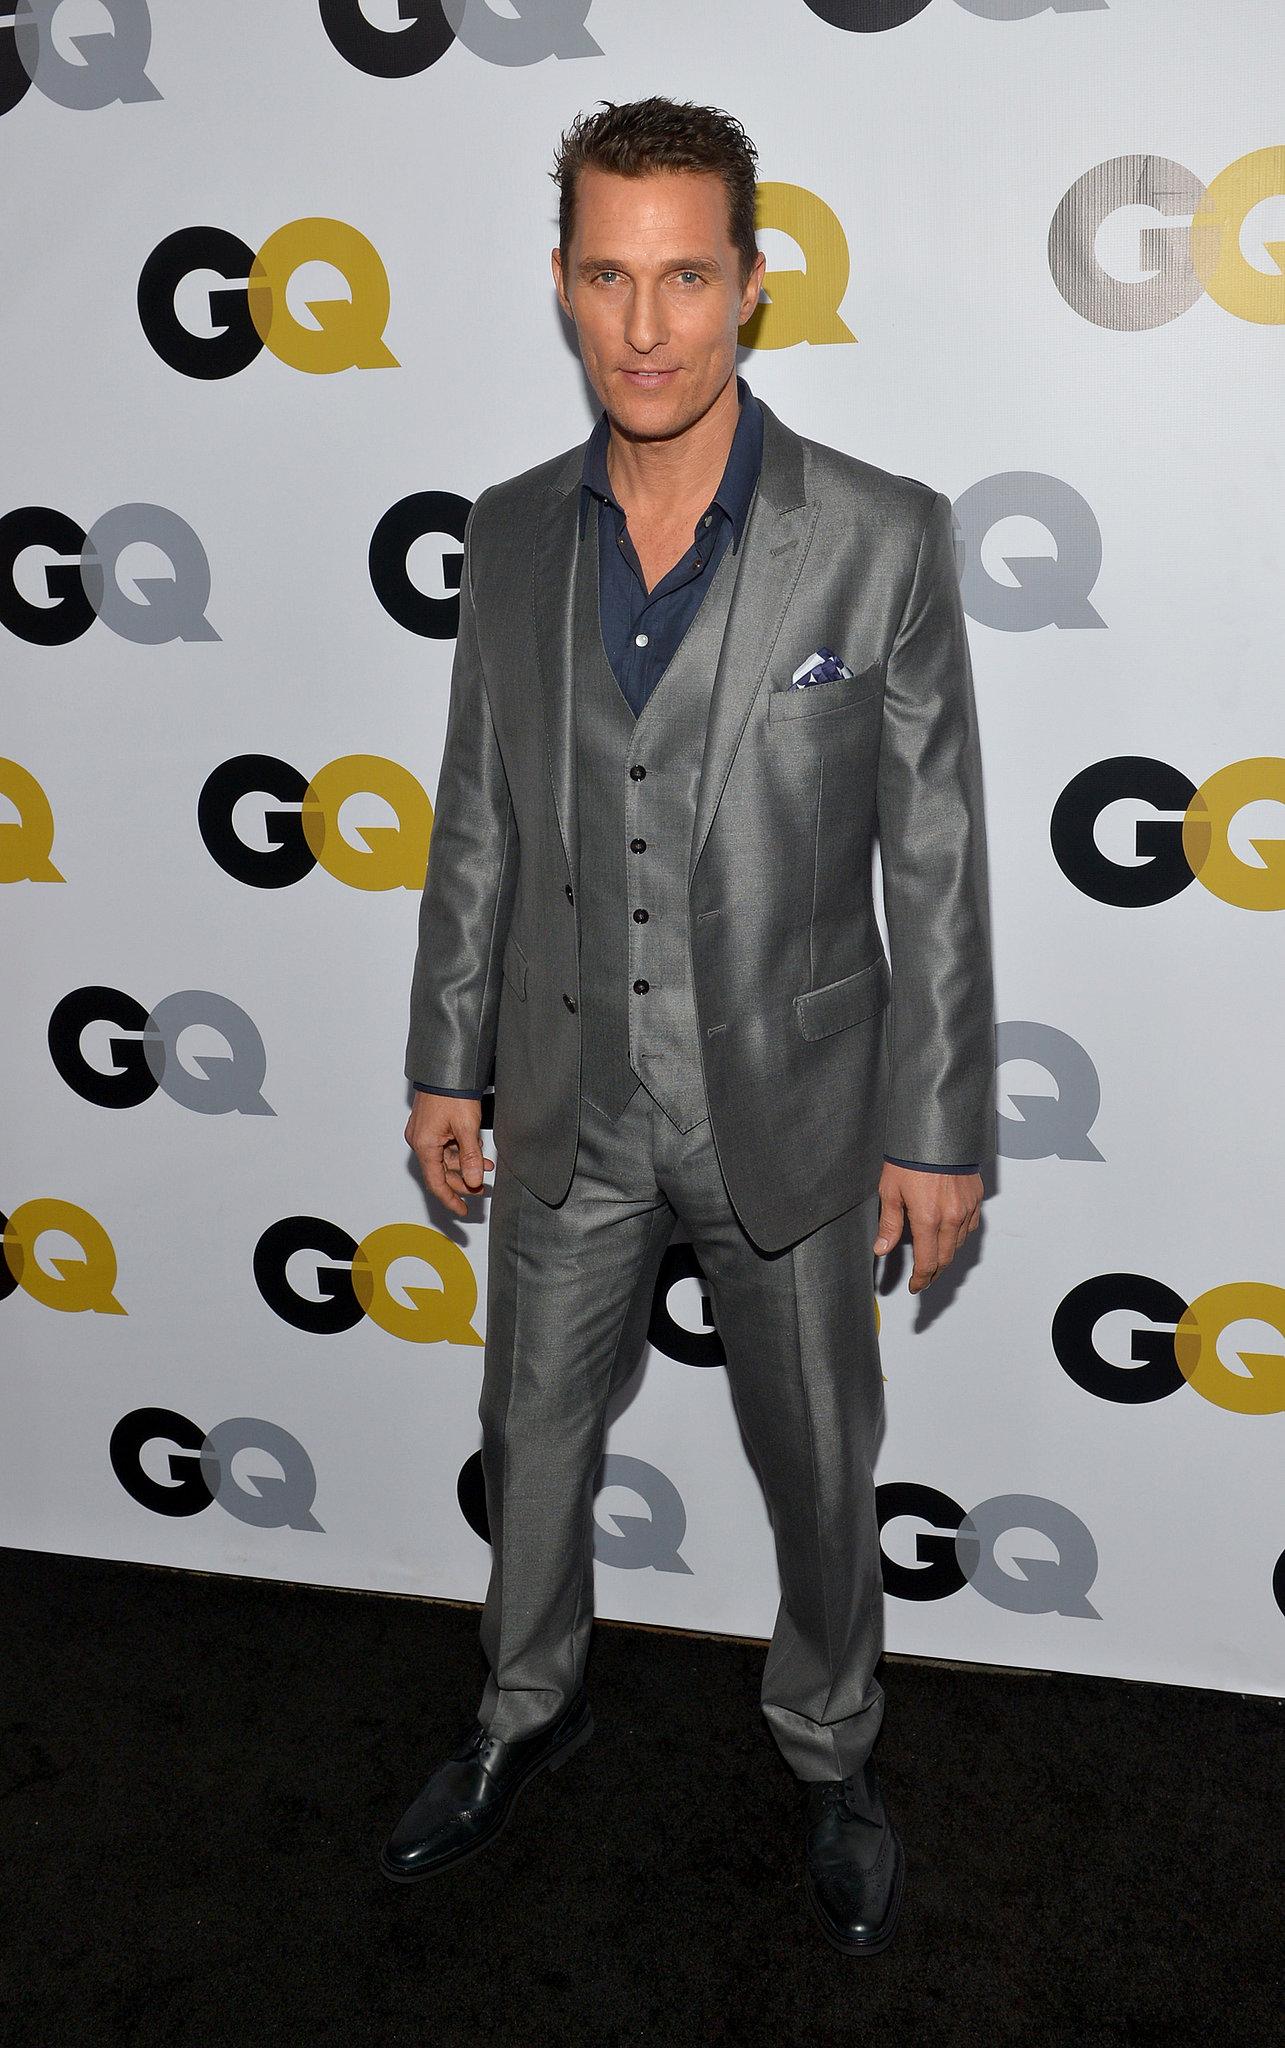 It's Raining Gentlemen at the GQ Party